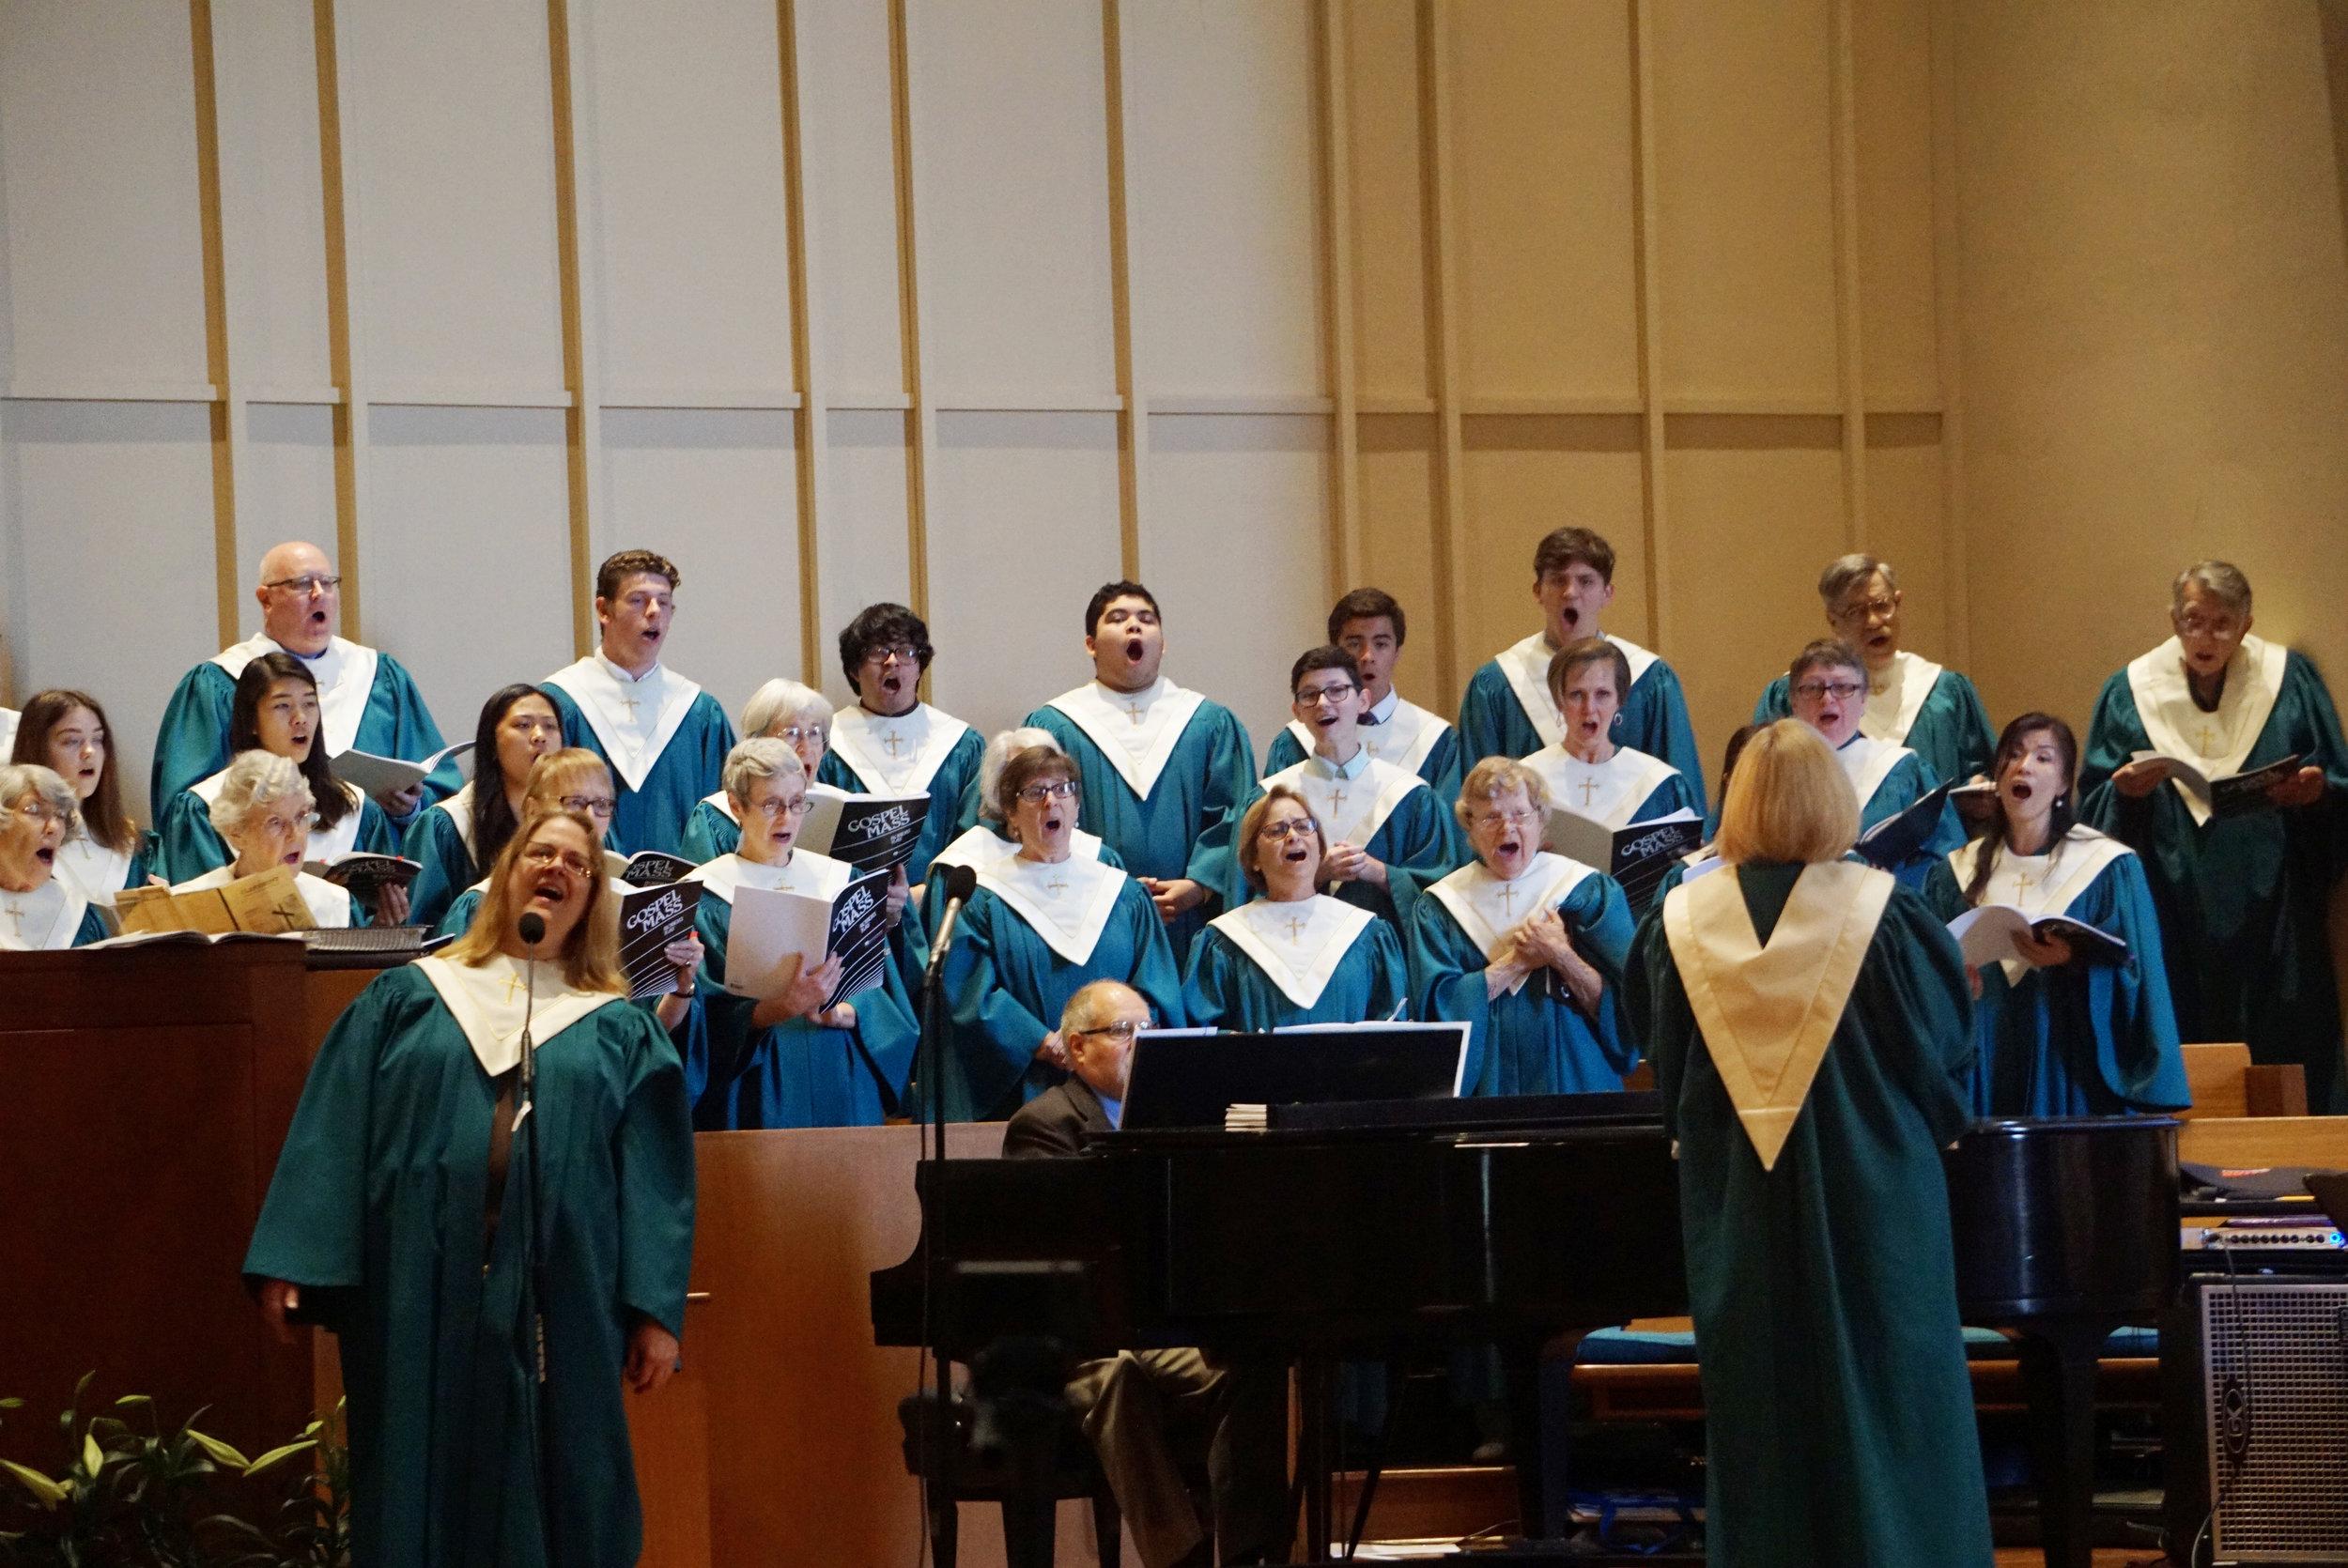 claremont-presbyterian-church-easter-choir-10.jpg